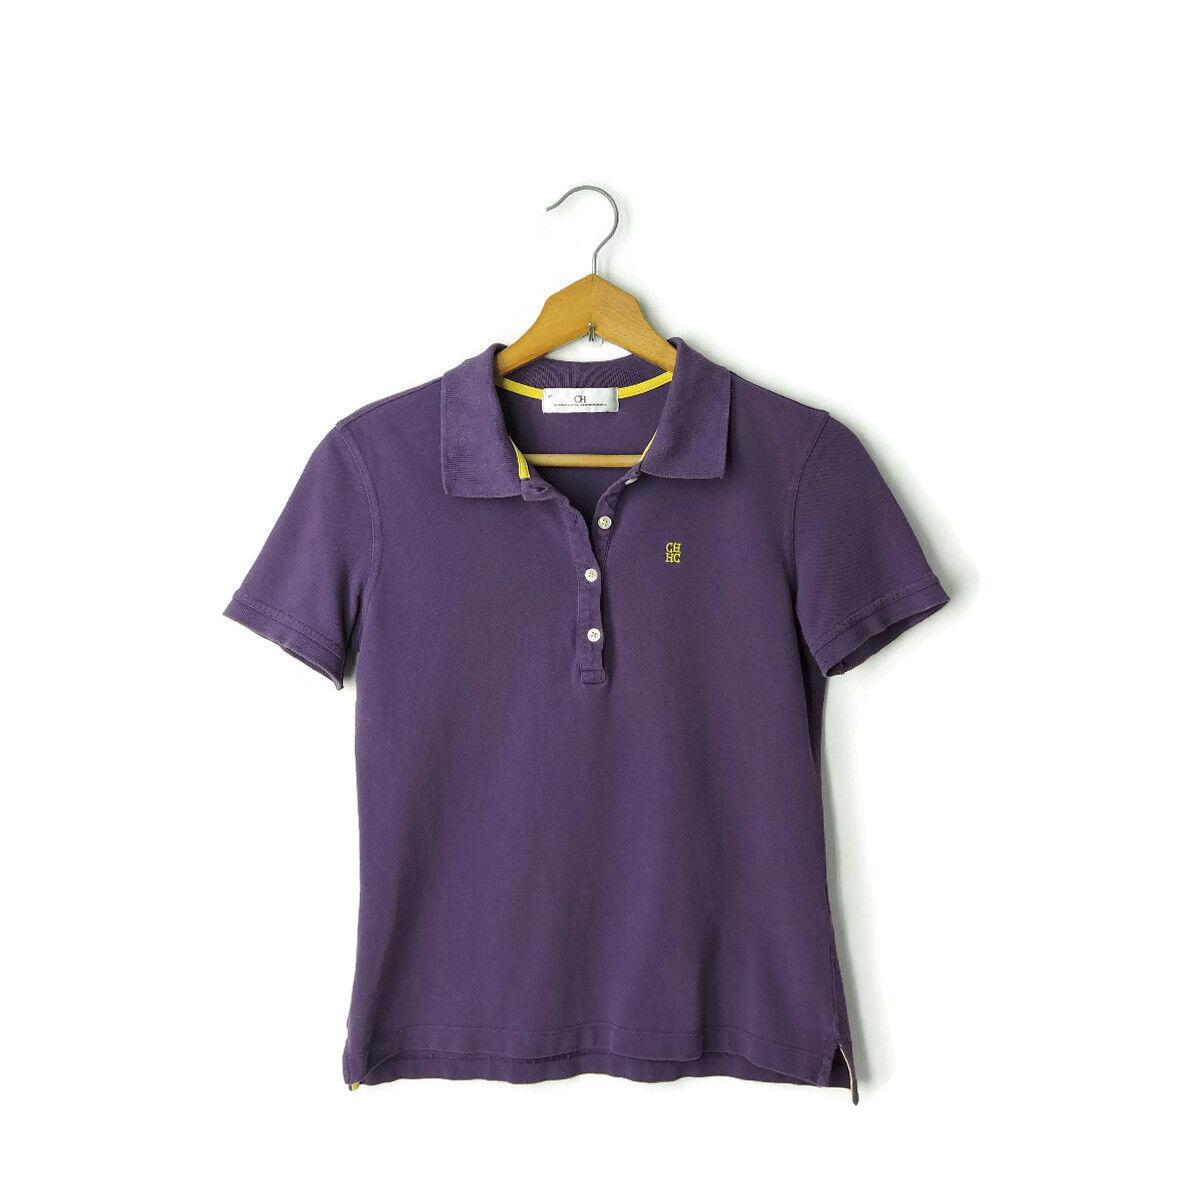 Carolina Herrera CH damen polo shirt top Größe M lila logo embroiderot